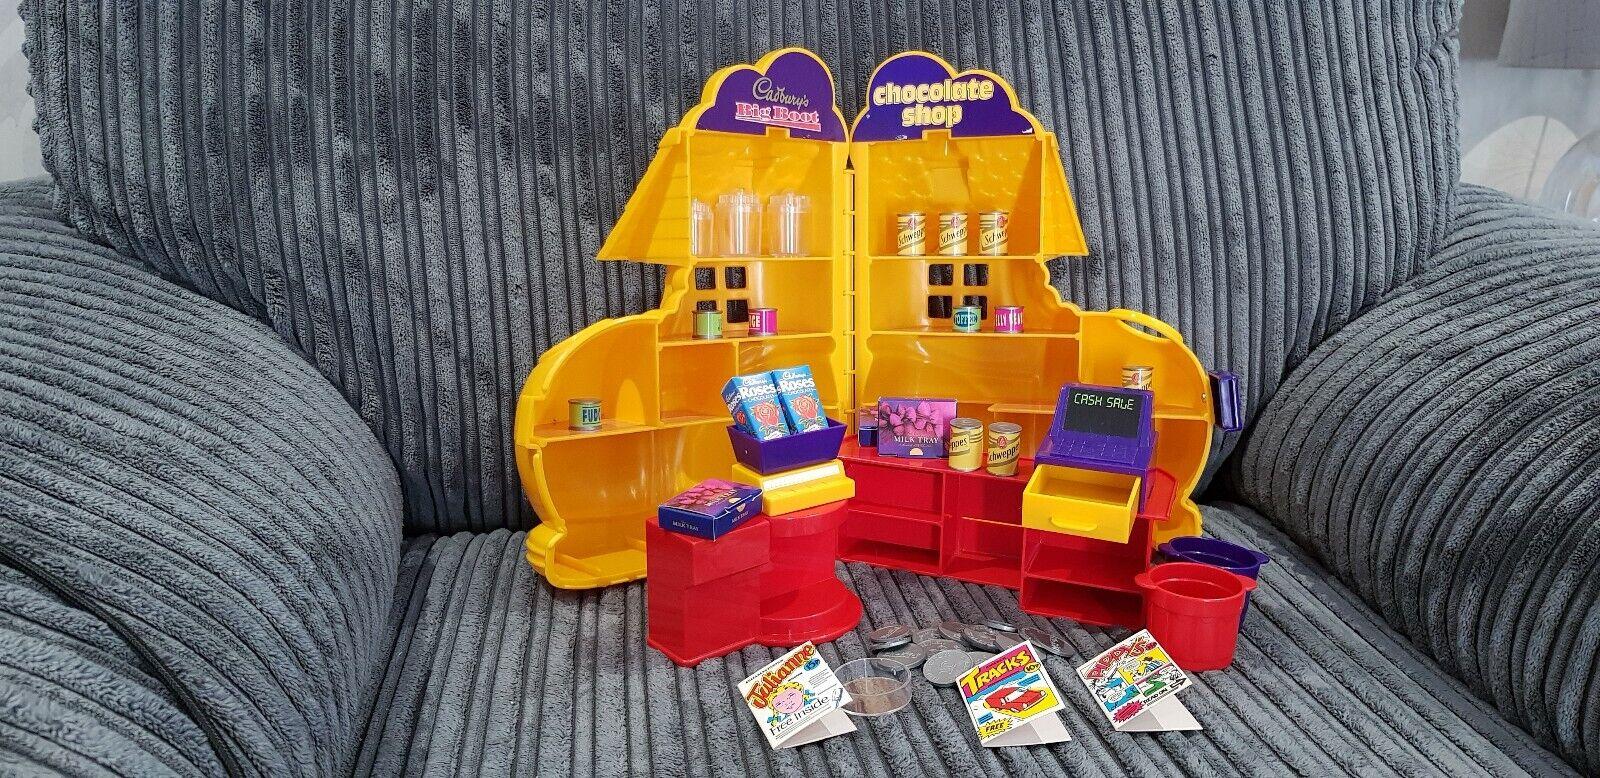 Peter pan Playthings Rare Vintage Cadburys Choclate Big démarrage Sweet  Shop Playset  shopping en ligne